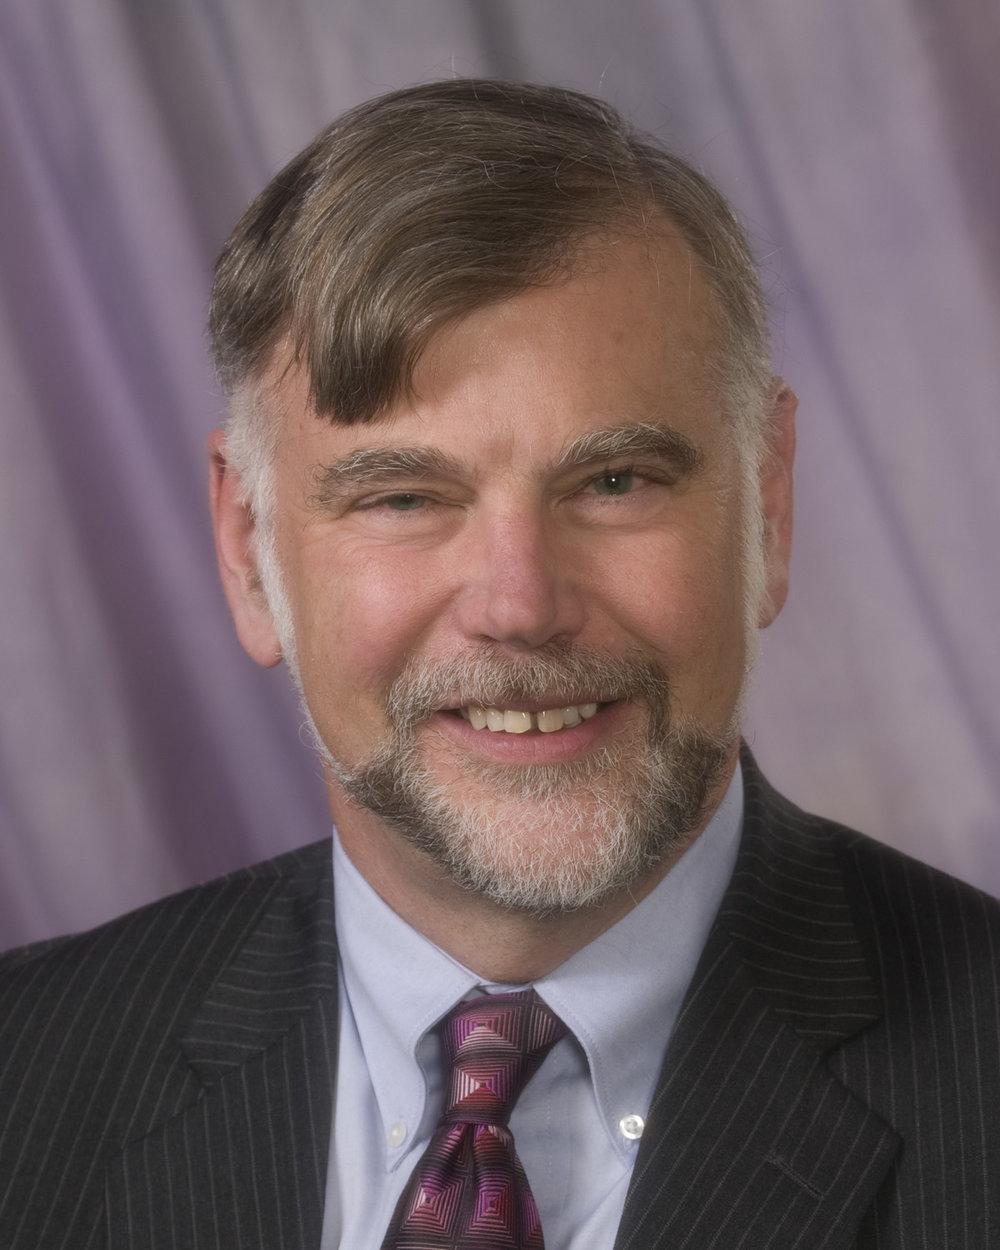 Dr. Robert Eckardt <br> Retired The Cleveland Foundation